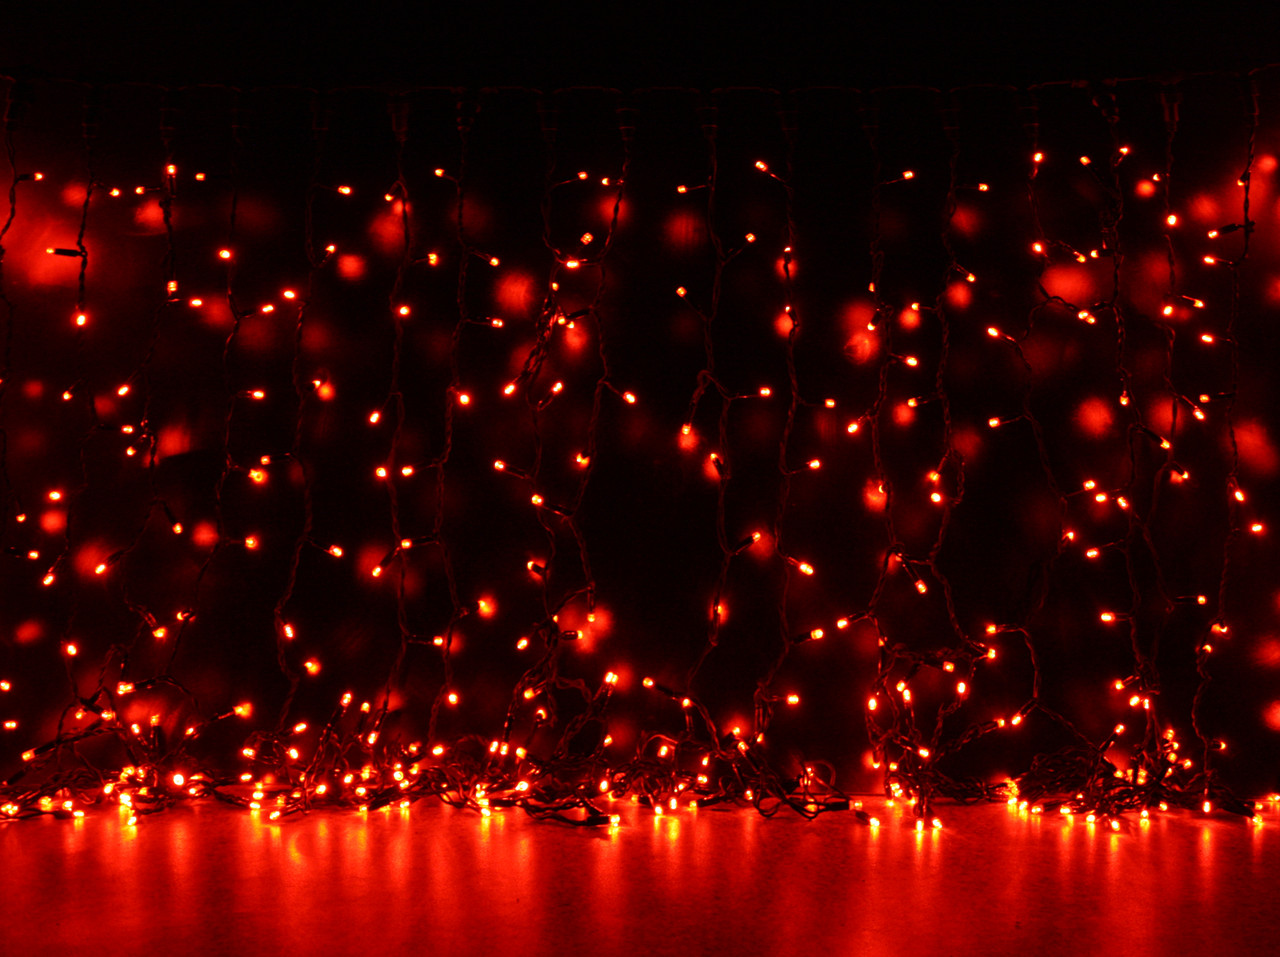 Уличная светодиодная гирлянда Штора Lumion Curtain (Куртейн) 912 led наружная цвет красный